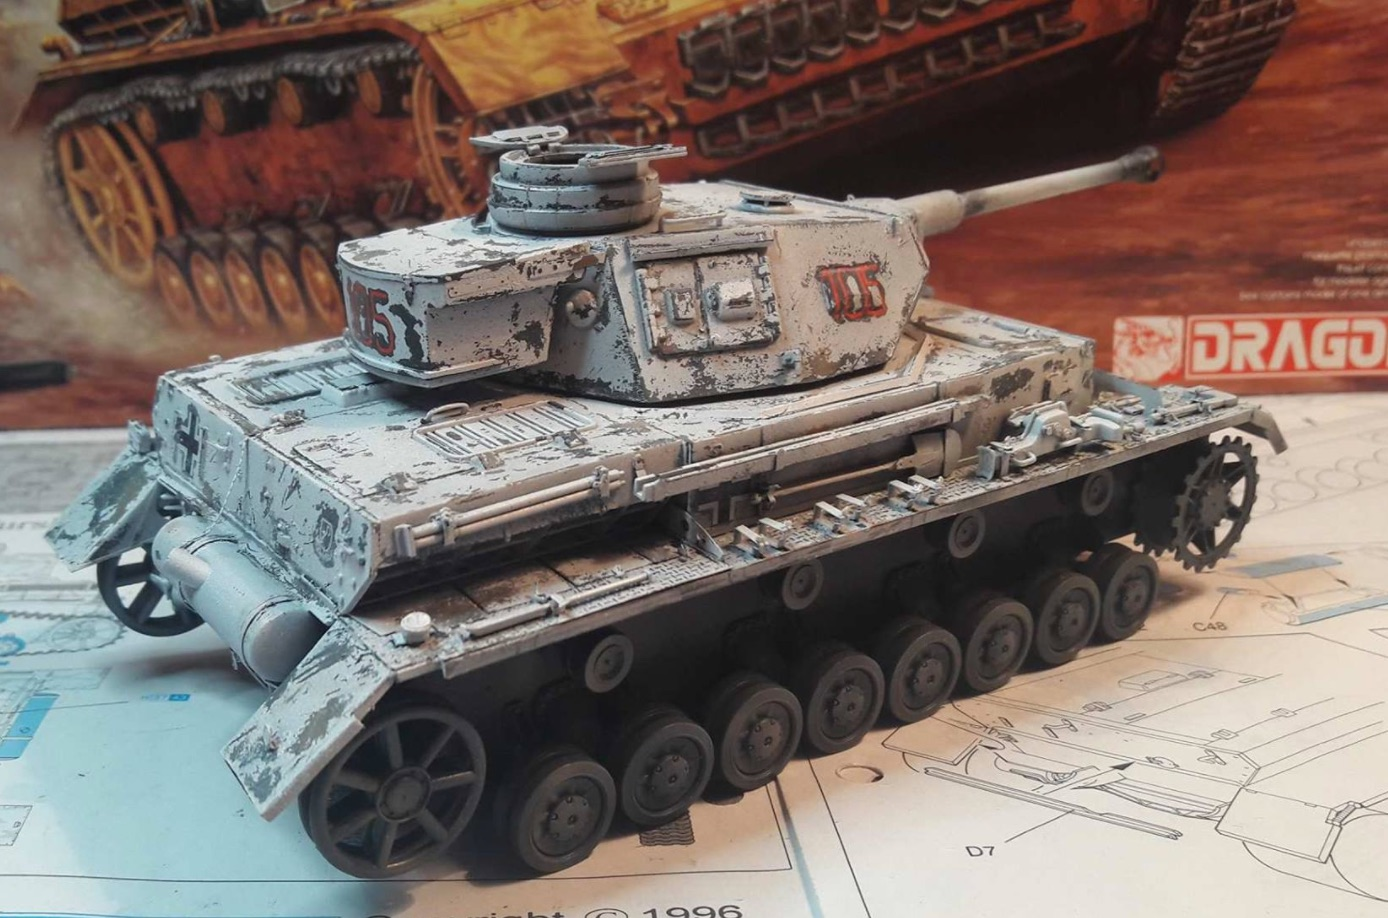 PzKpfw. IV Ausf. F2 - Dragon - Page 2 606963WhiteWash2